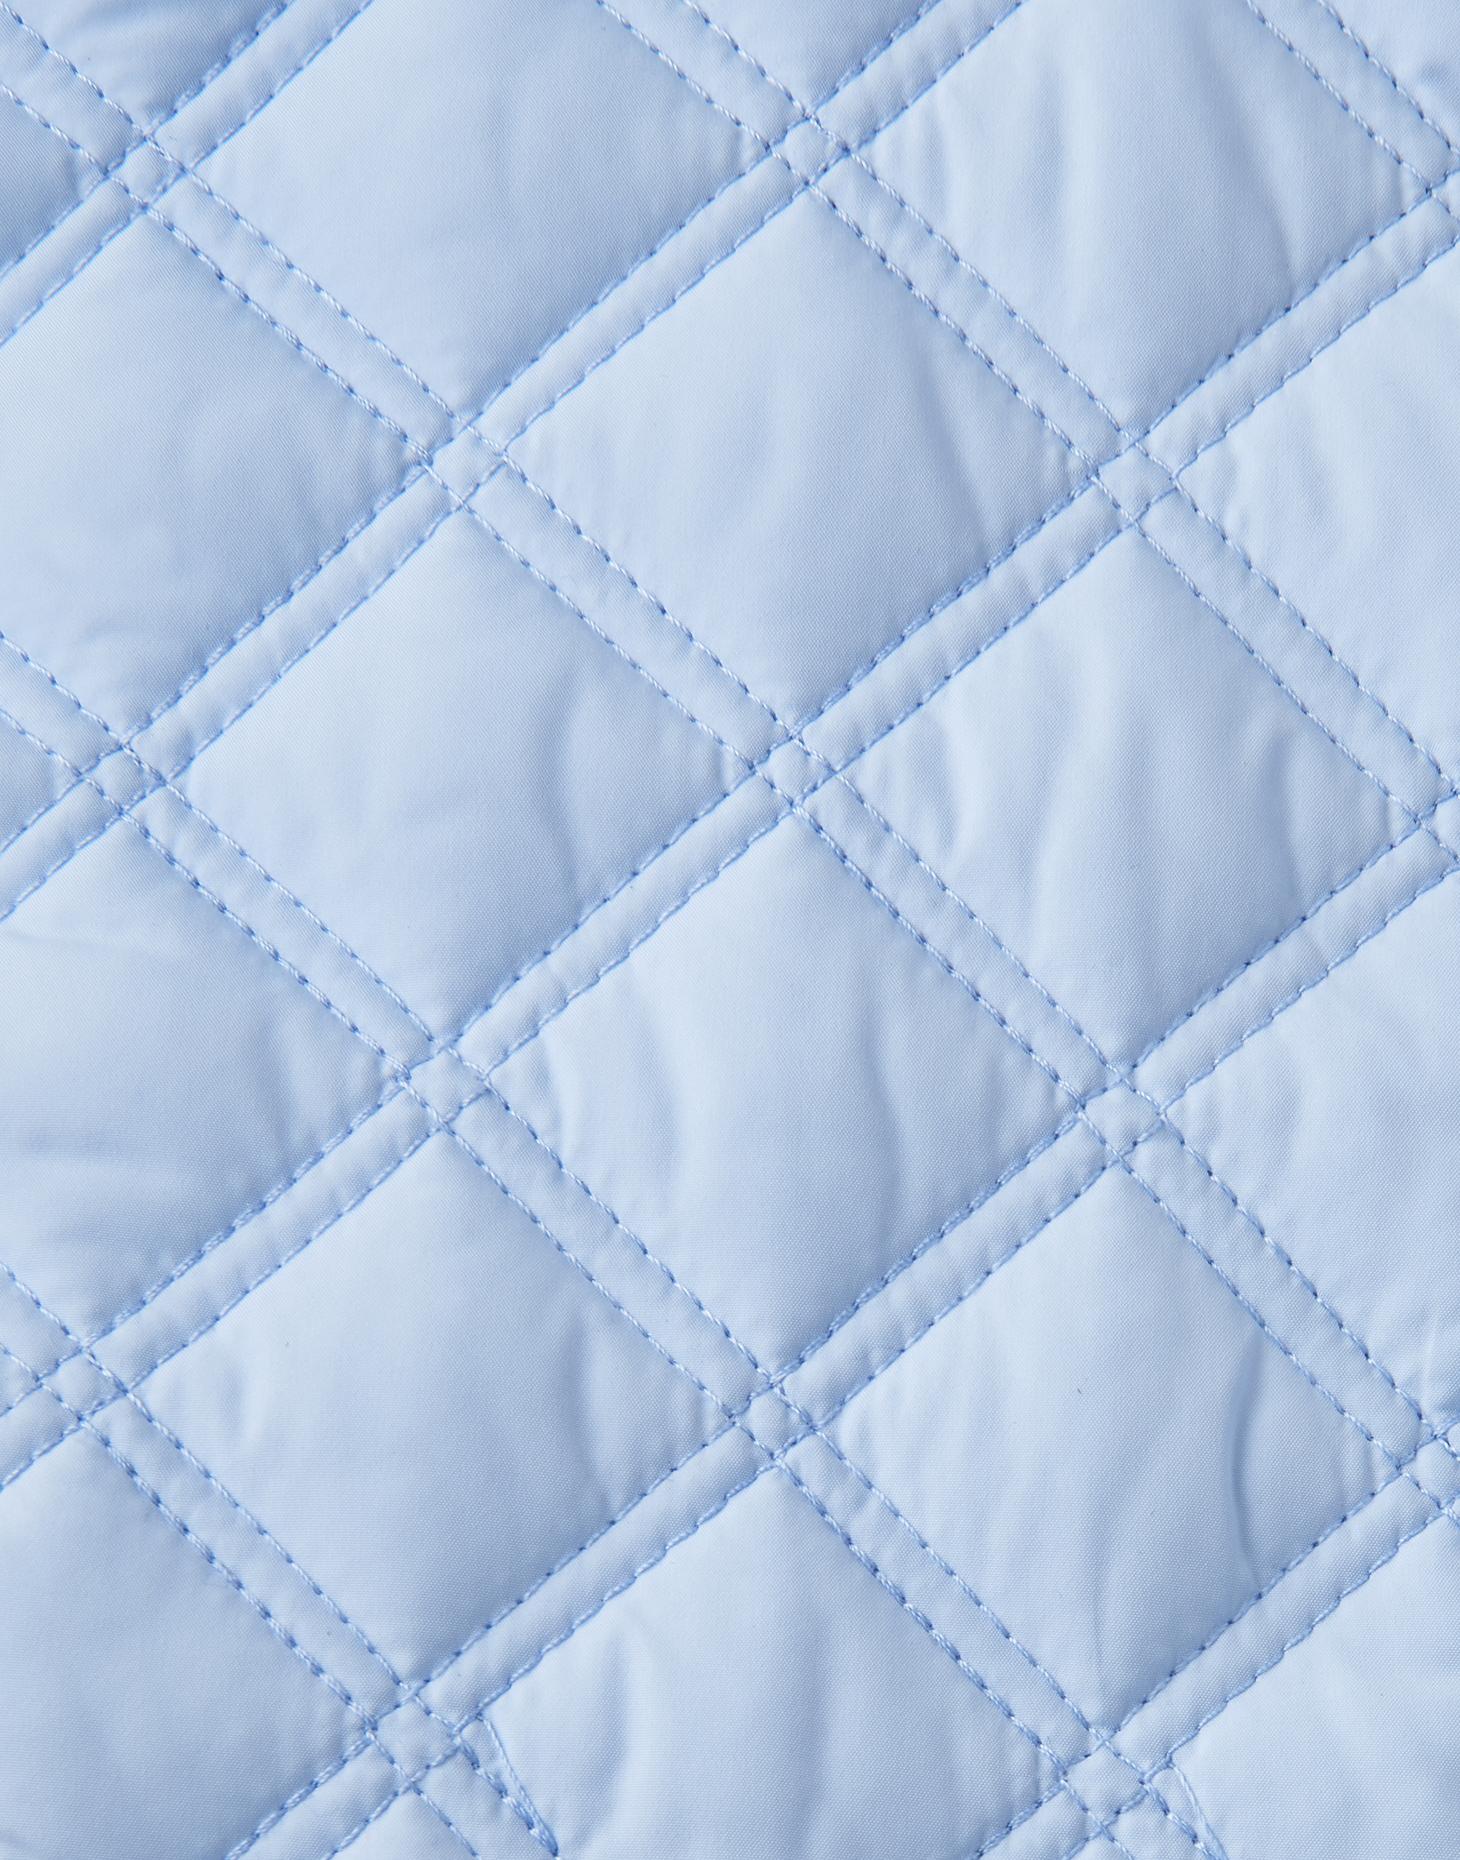 Joules Joules Joules Minx Damen Gesteppte Weste - Blau 7f3db6